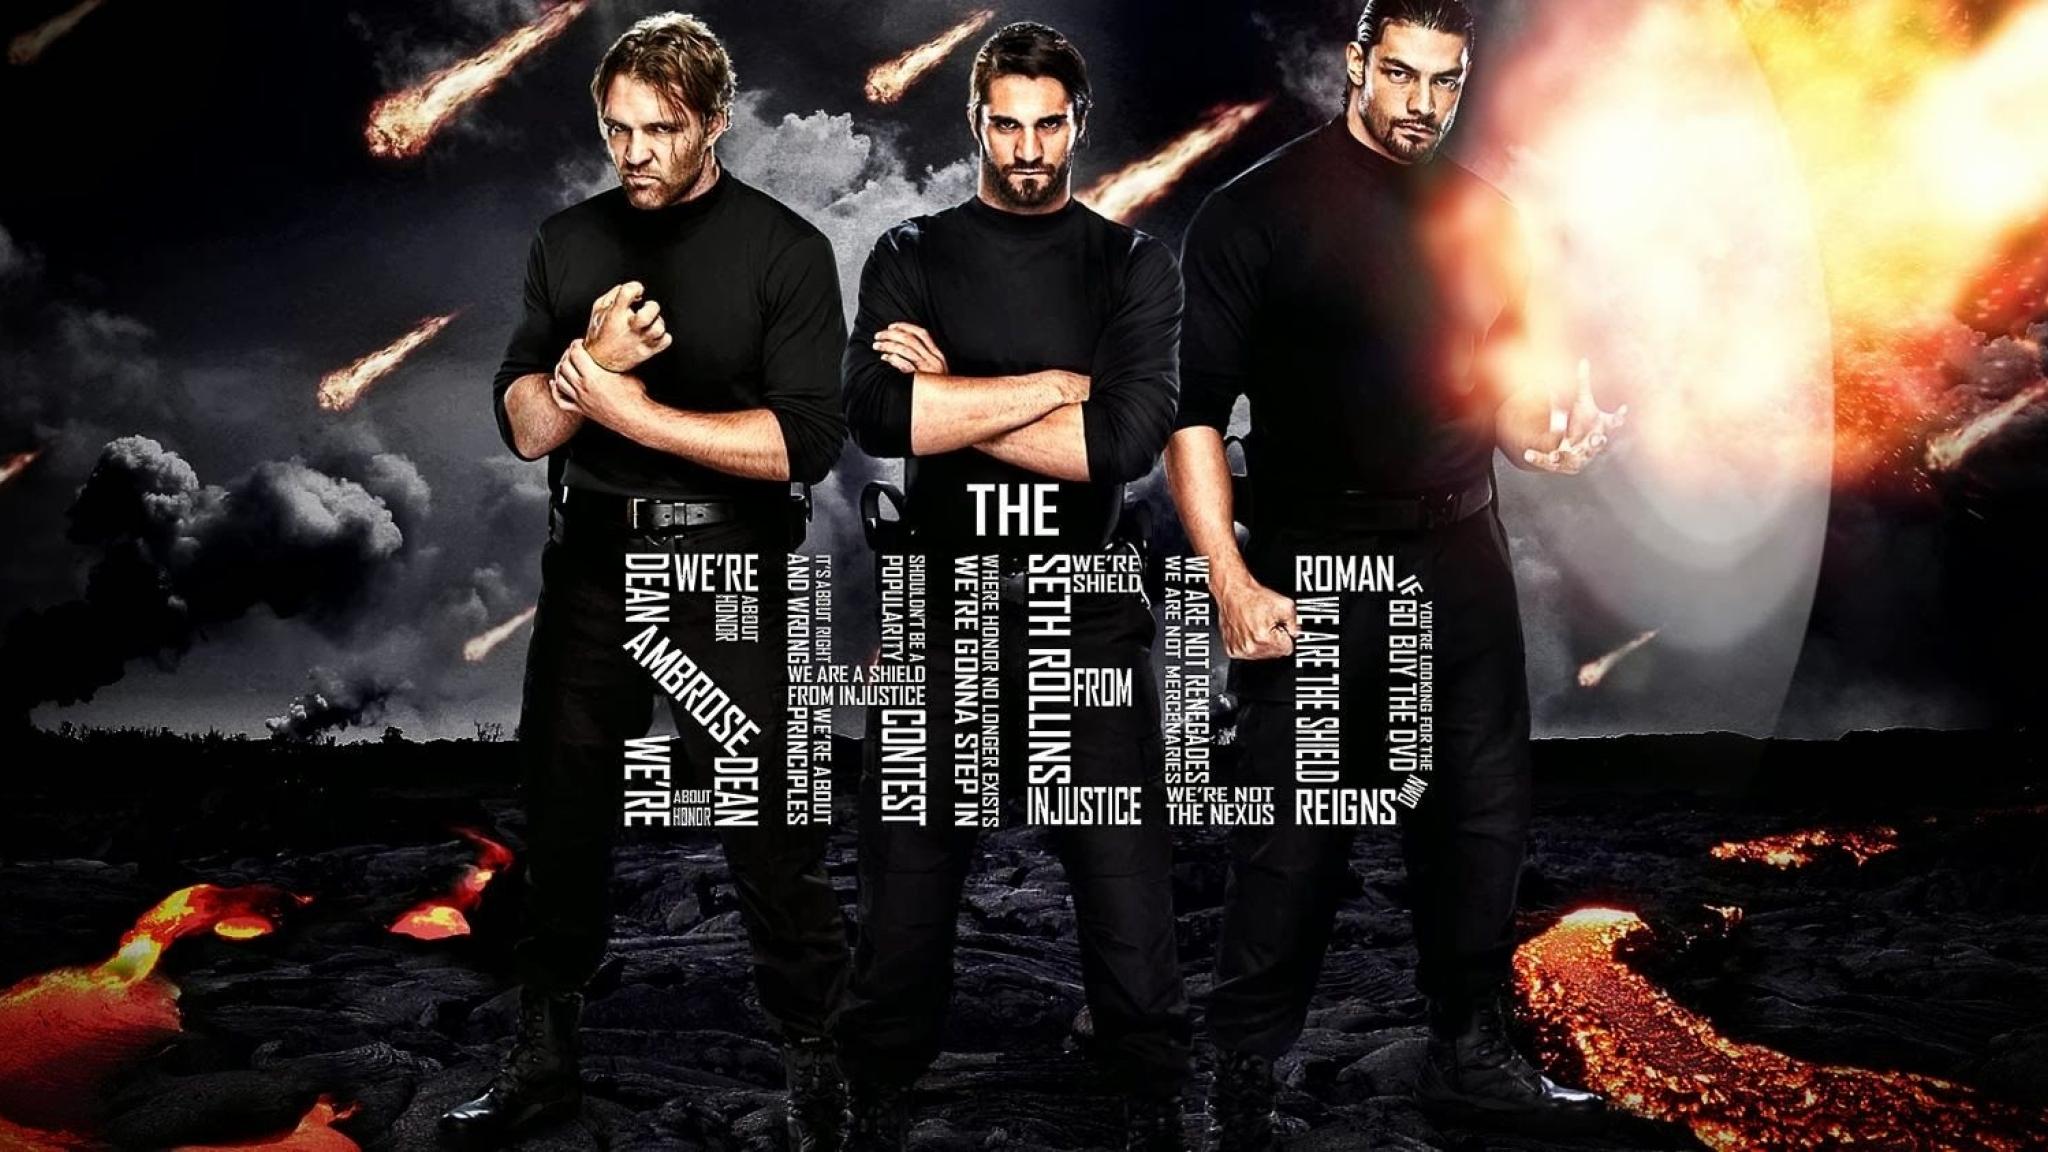 Wwe The Shield Hd Wallpaper